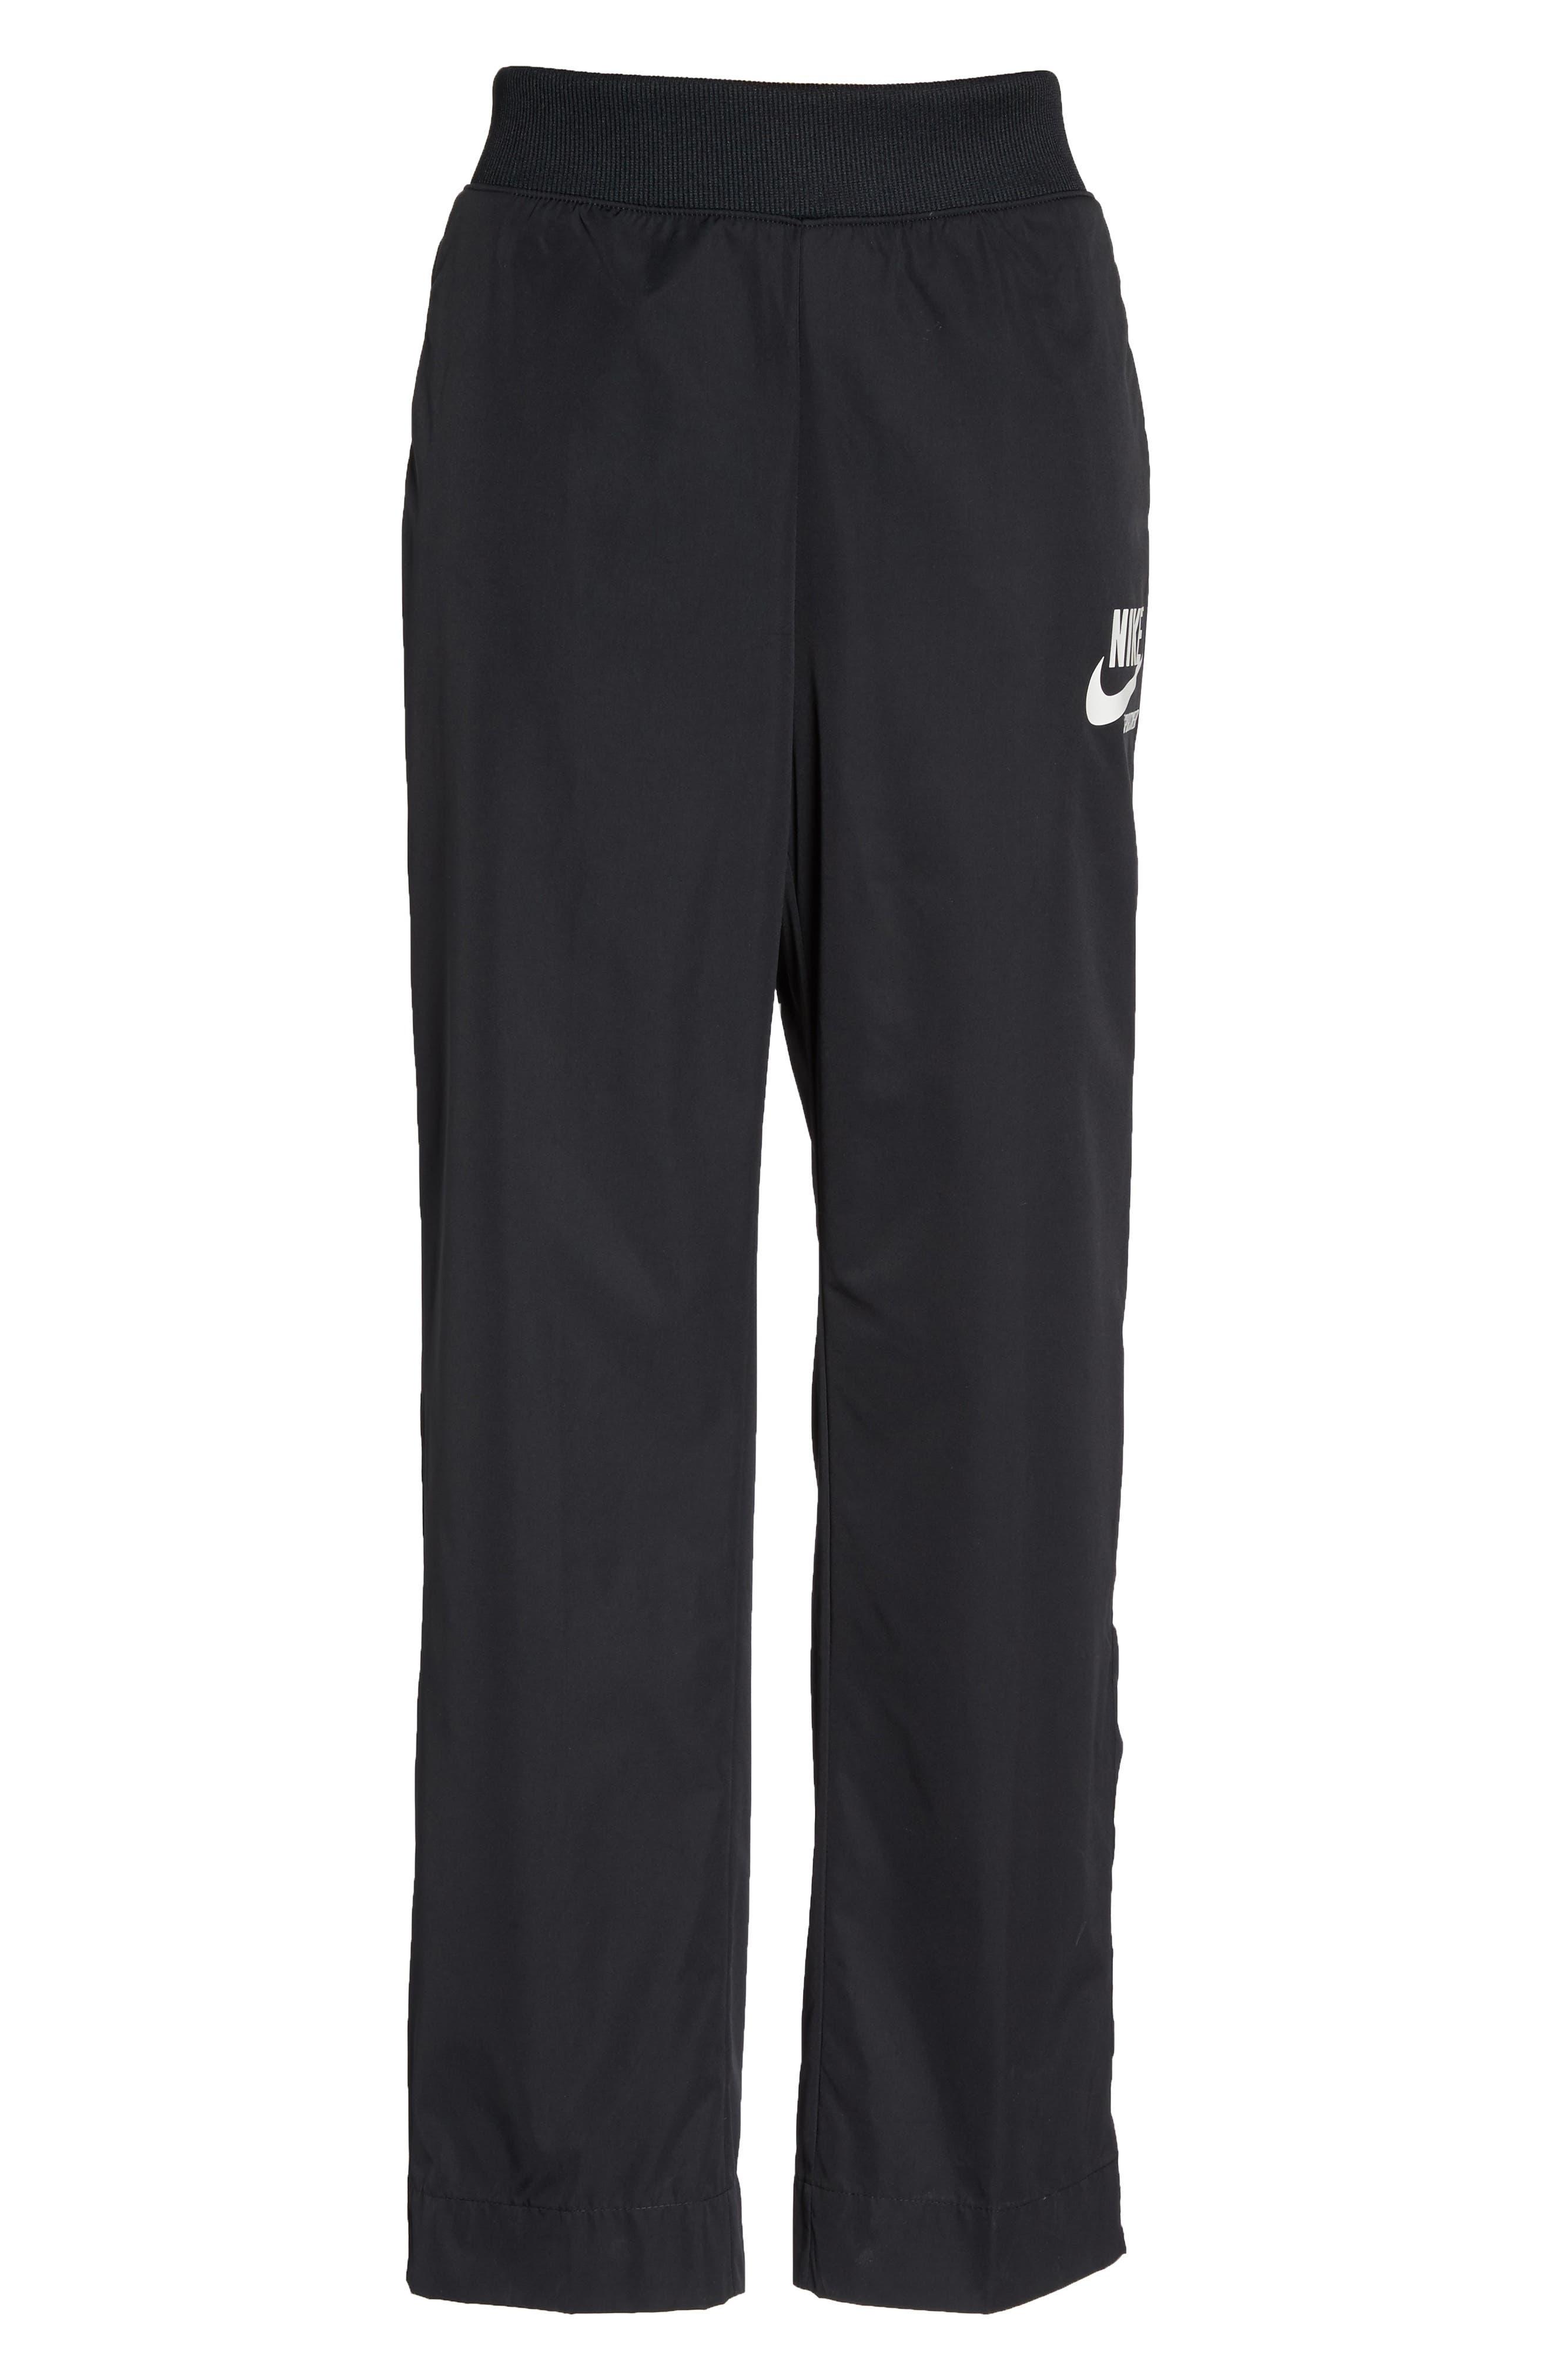 Sportswear Archive Snap Track Pants,                             Alternate thumbnail 7, color,                             Black/ Sail